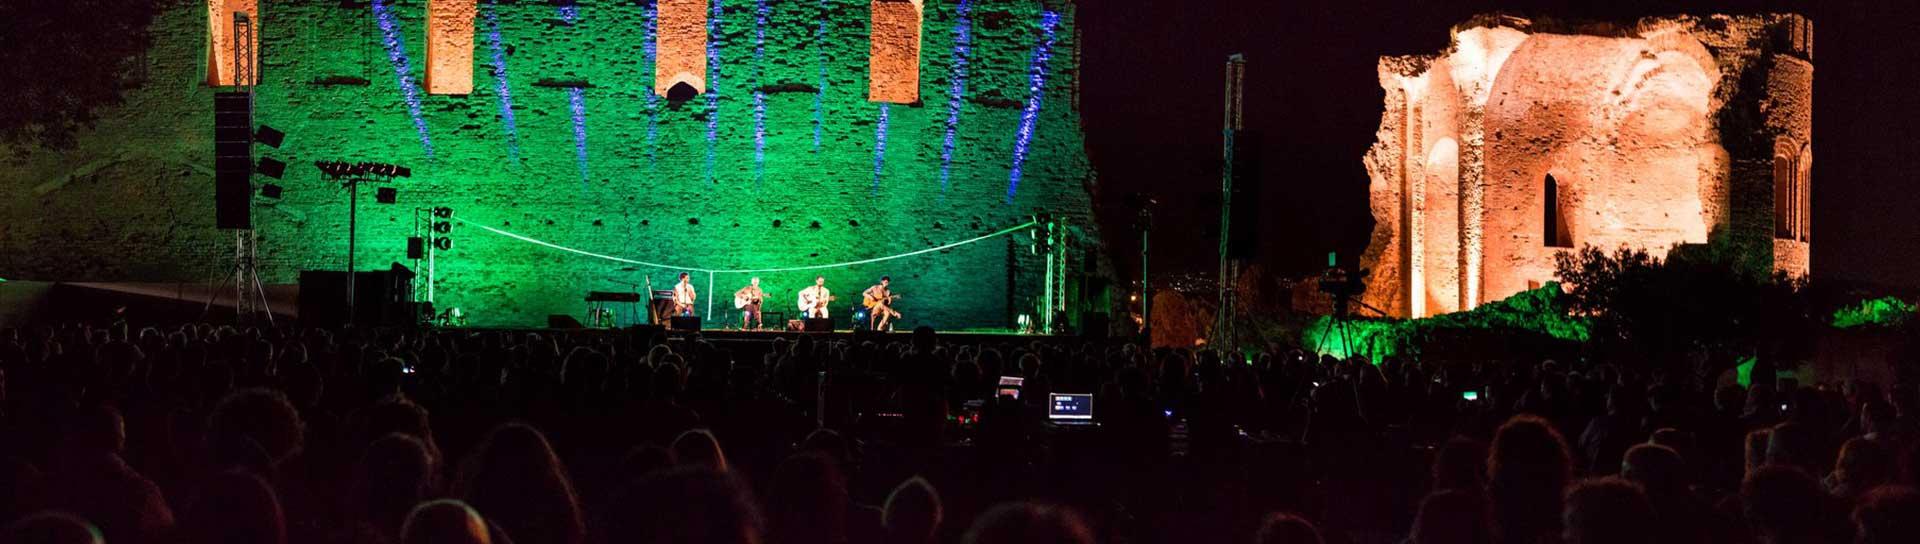 CAETANO VELOSO ad Armonie d'Arte Festival